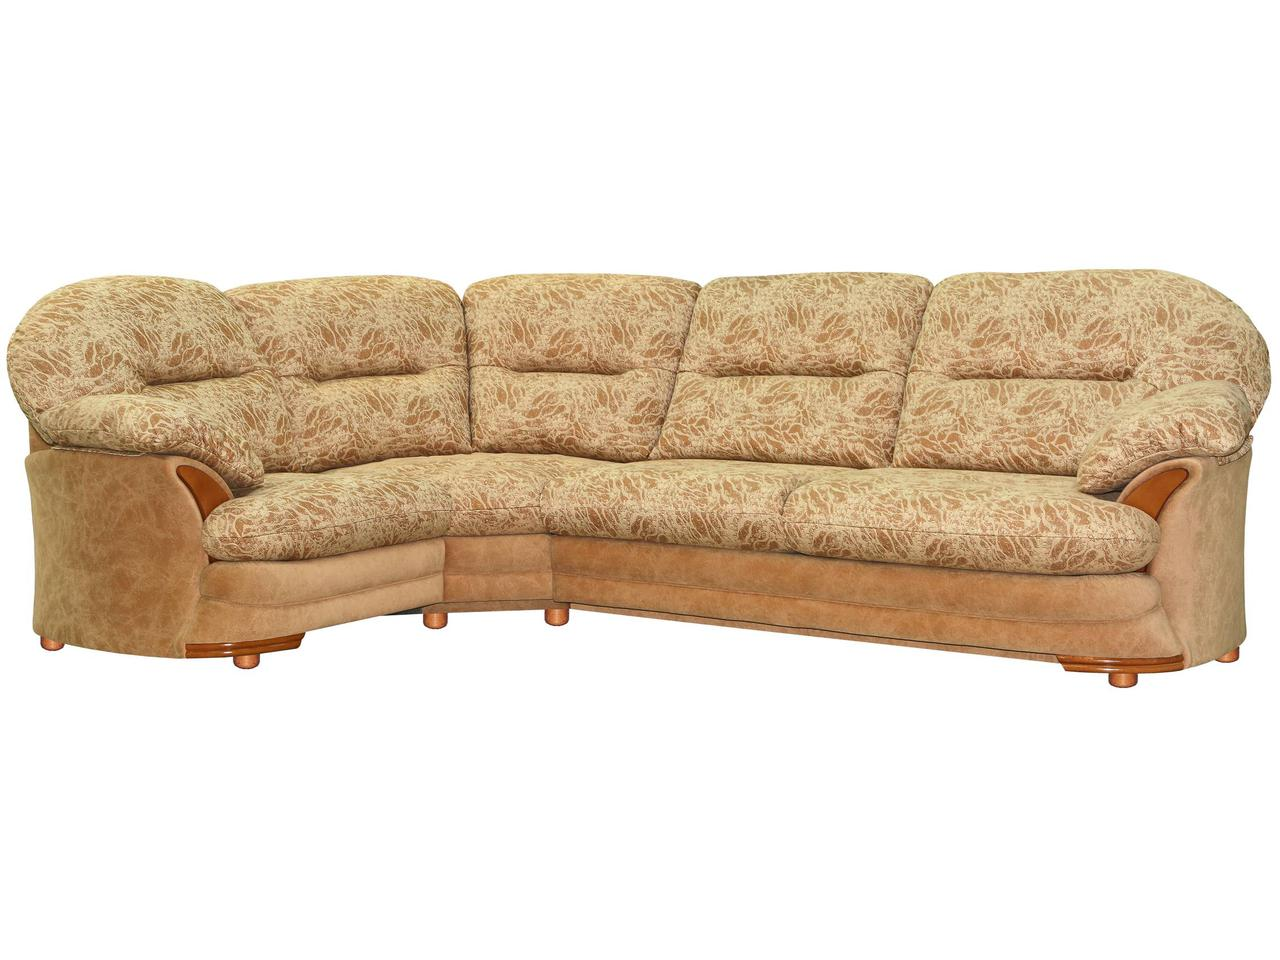 Мягкий угловой диван Нью-Йорк